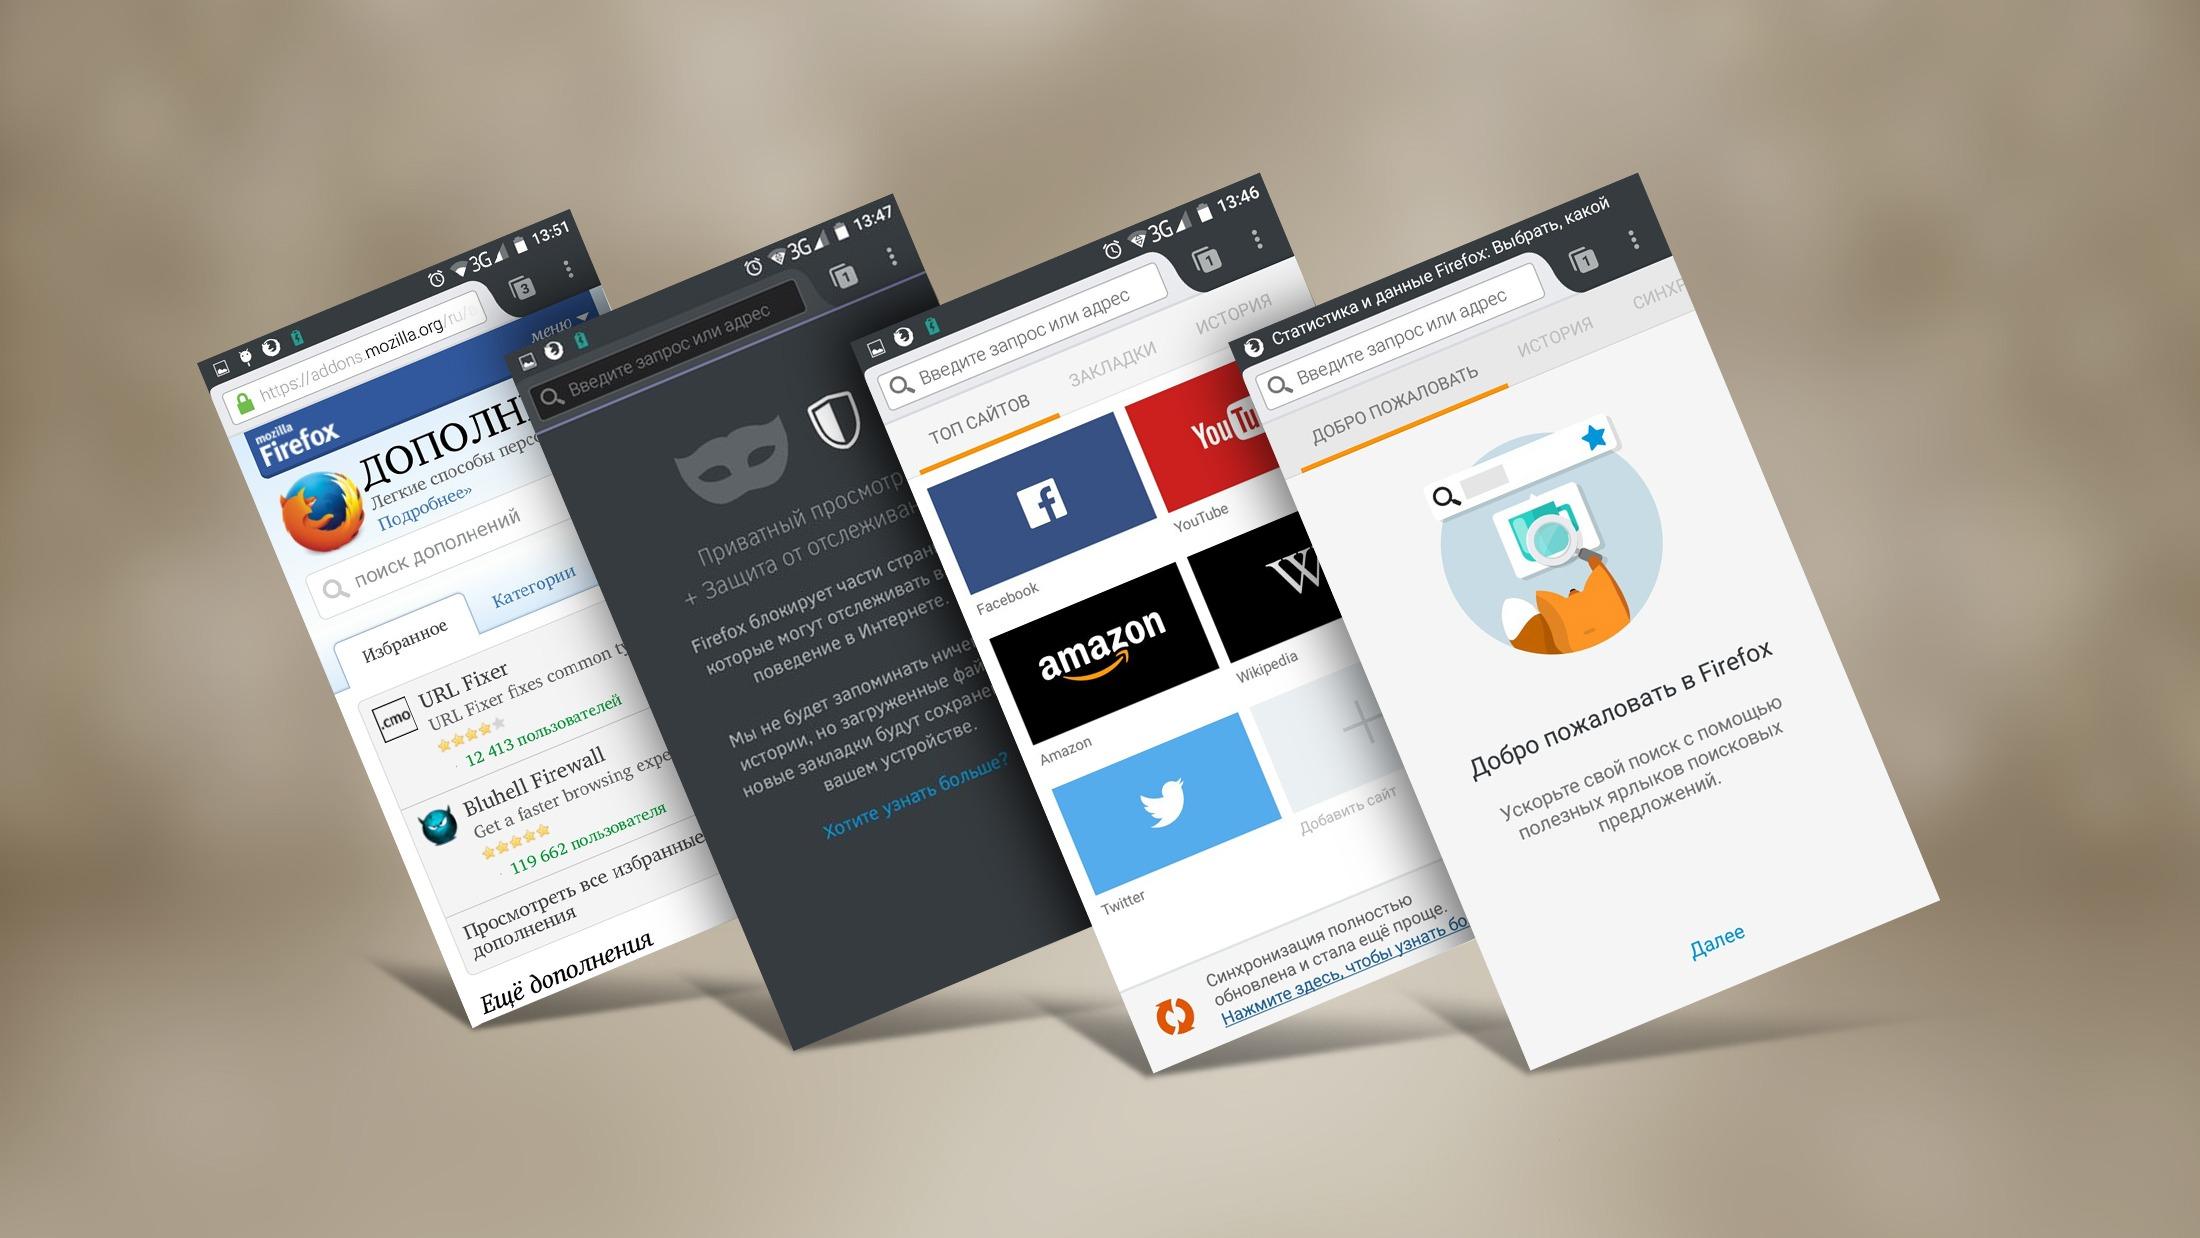 Firefox - браузер для андроид